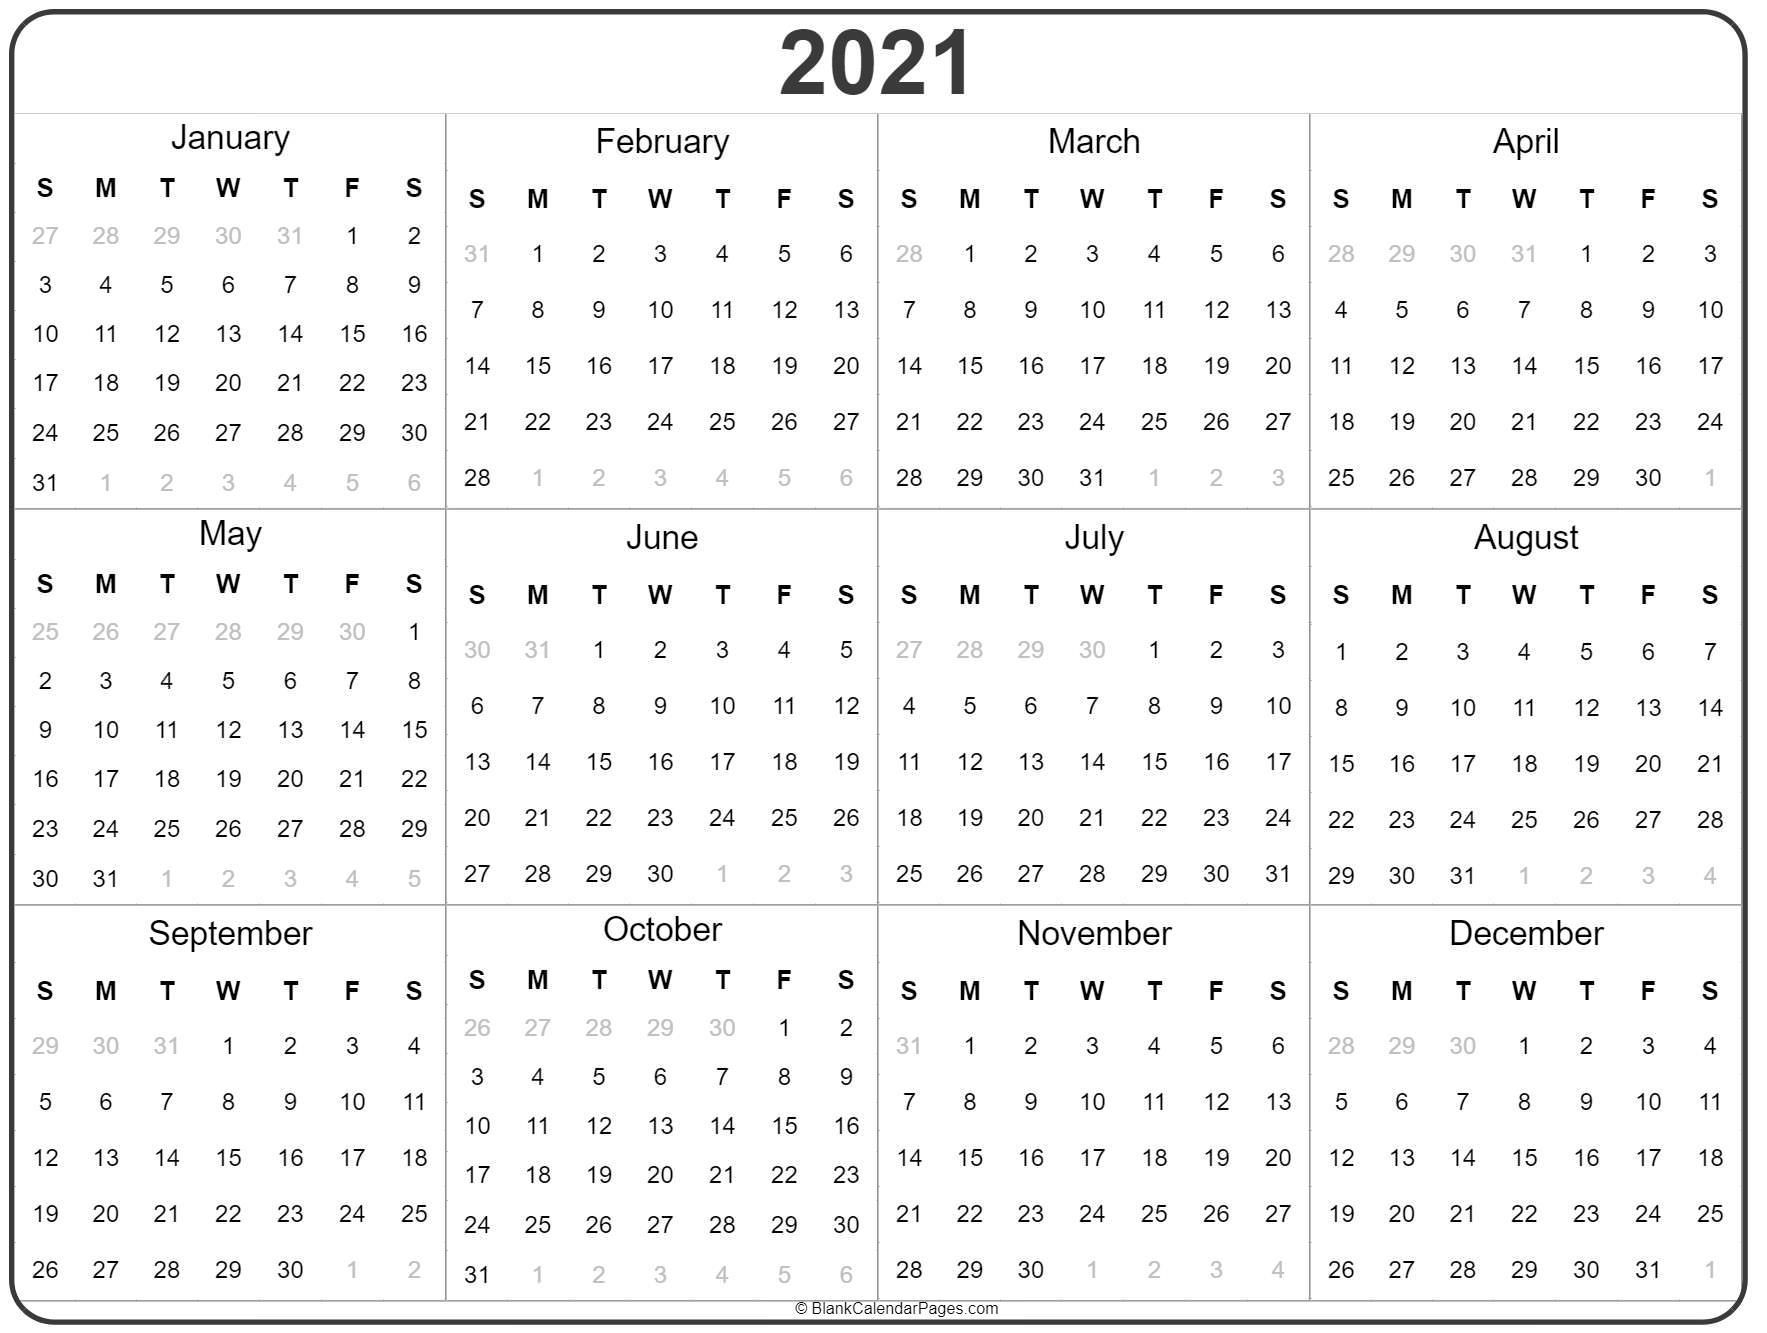 2021 Yearly Calendar Printable